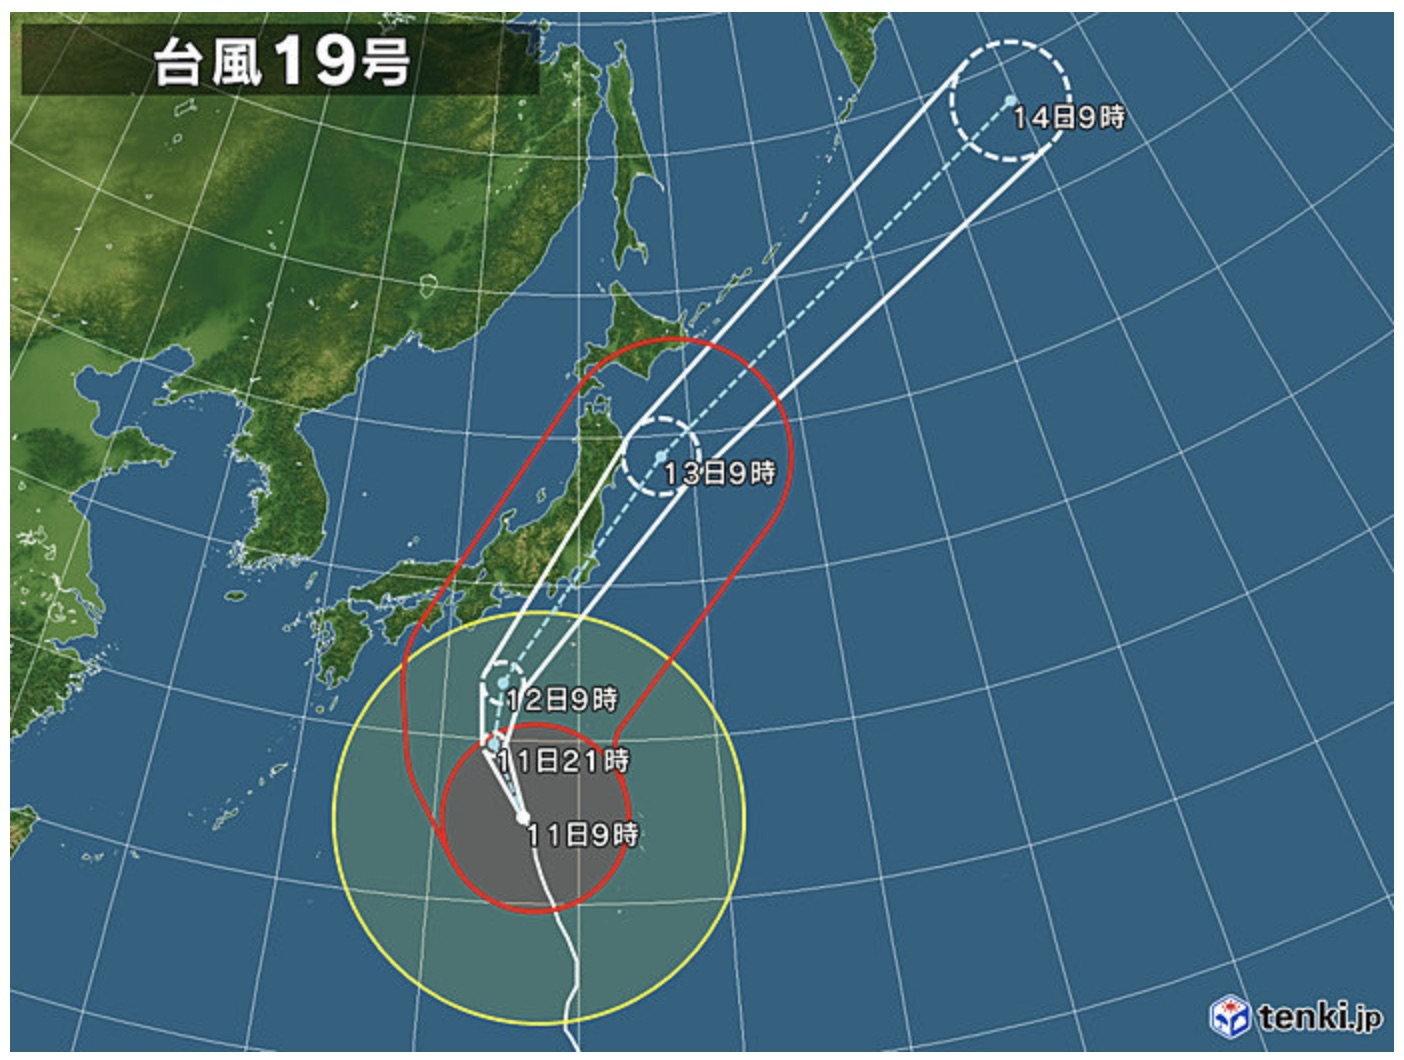 台風 19 号 の 進路 気象庁